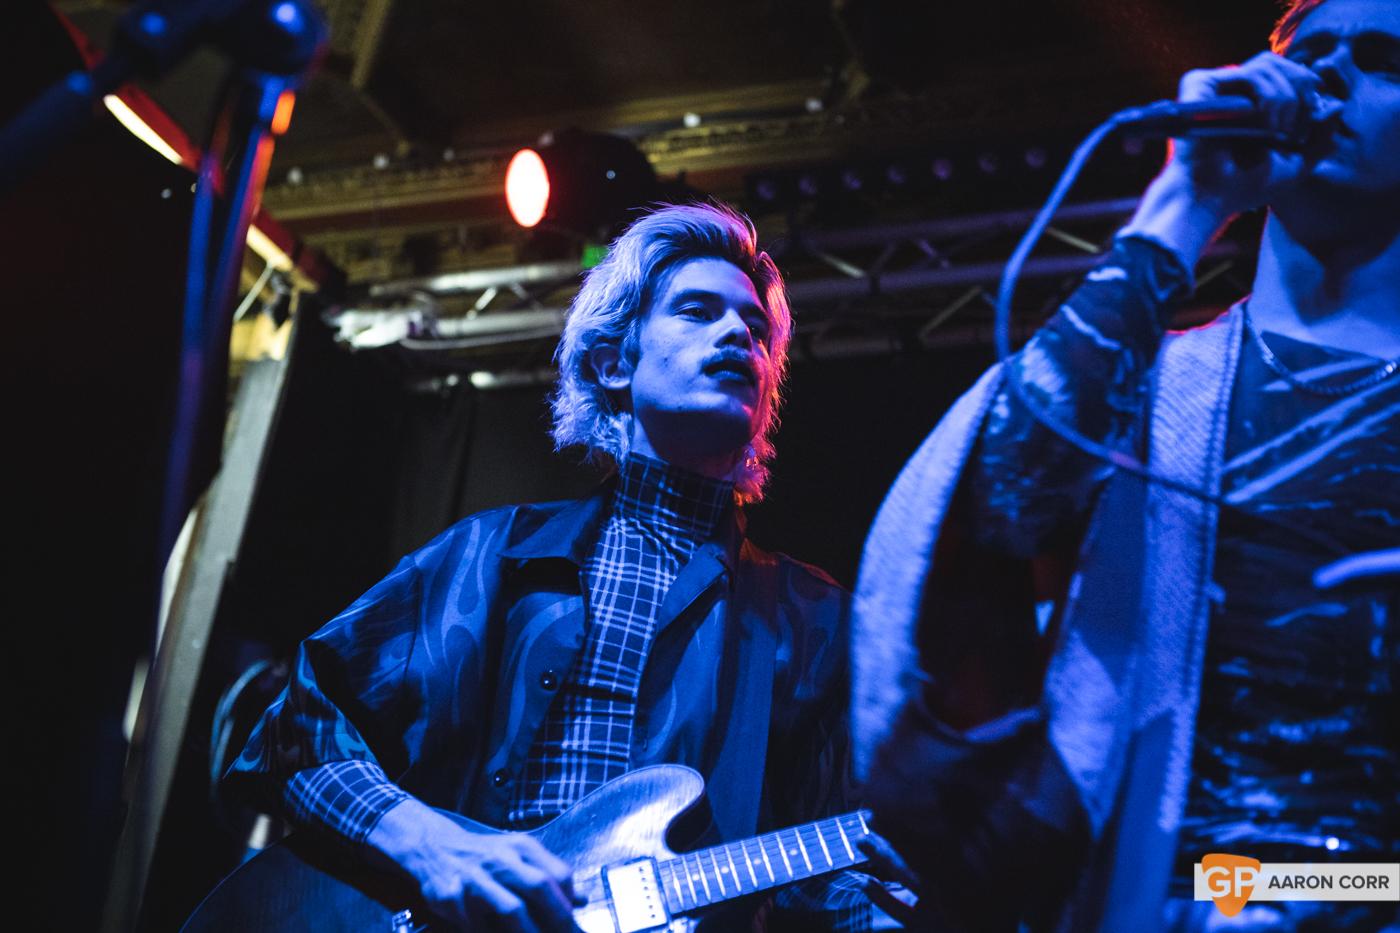 HMLTD live at The Sound House, Dublin on 17-Feb-20 by Aaron Corr-2197